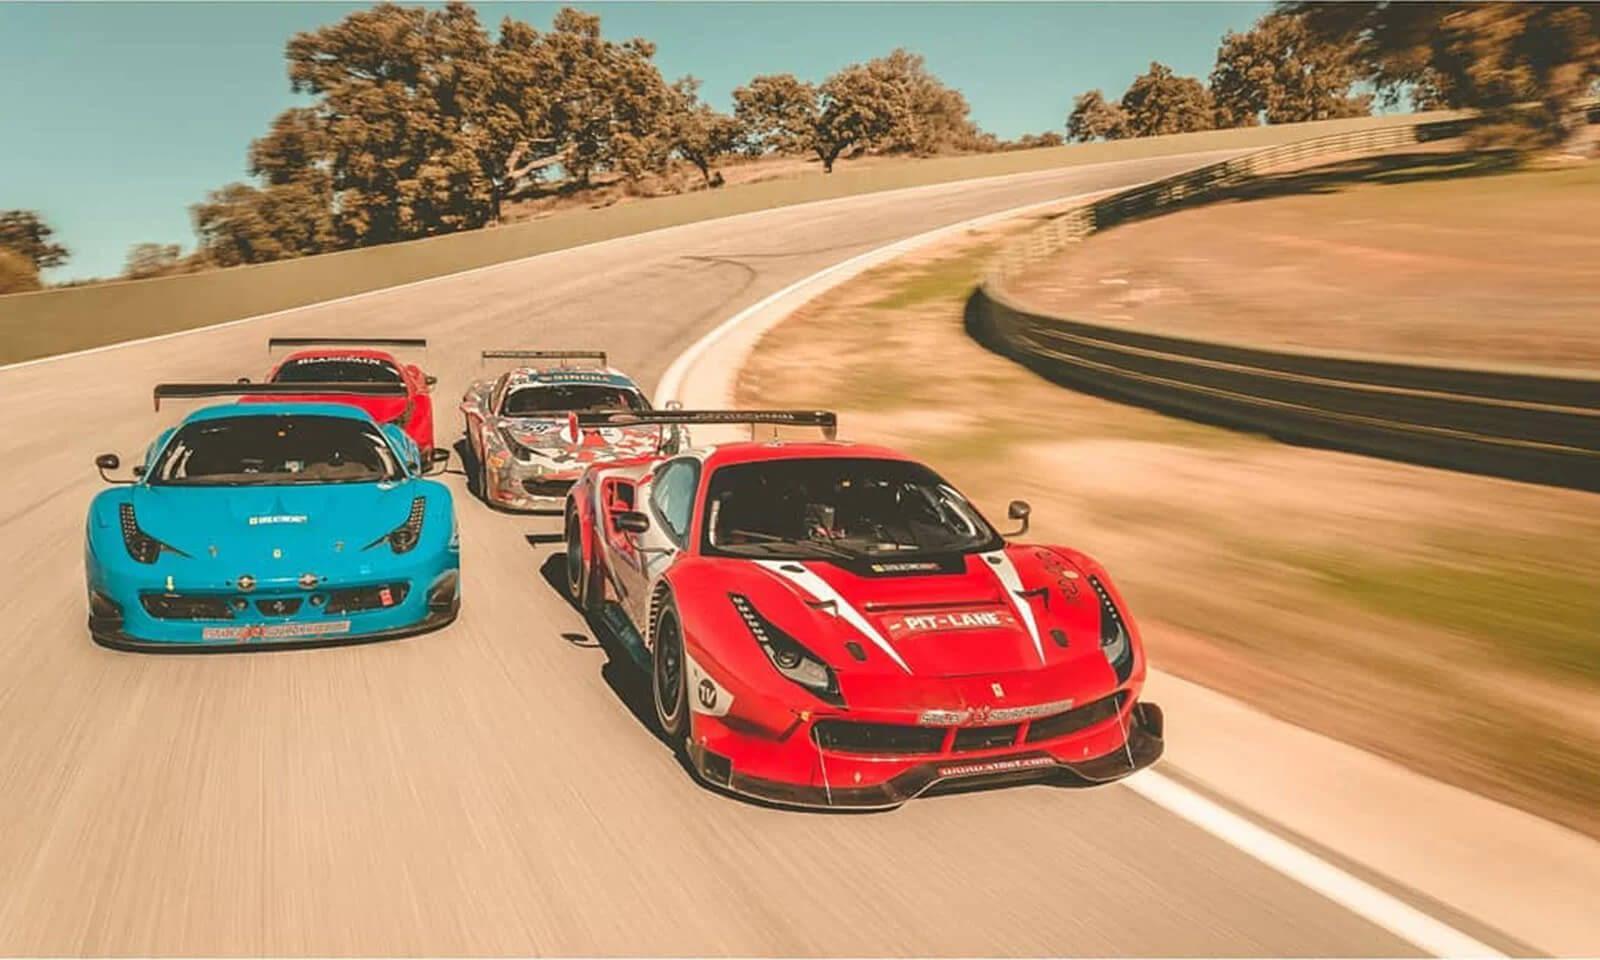 Marbella racing experience